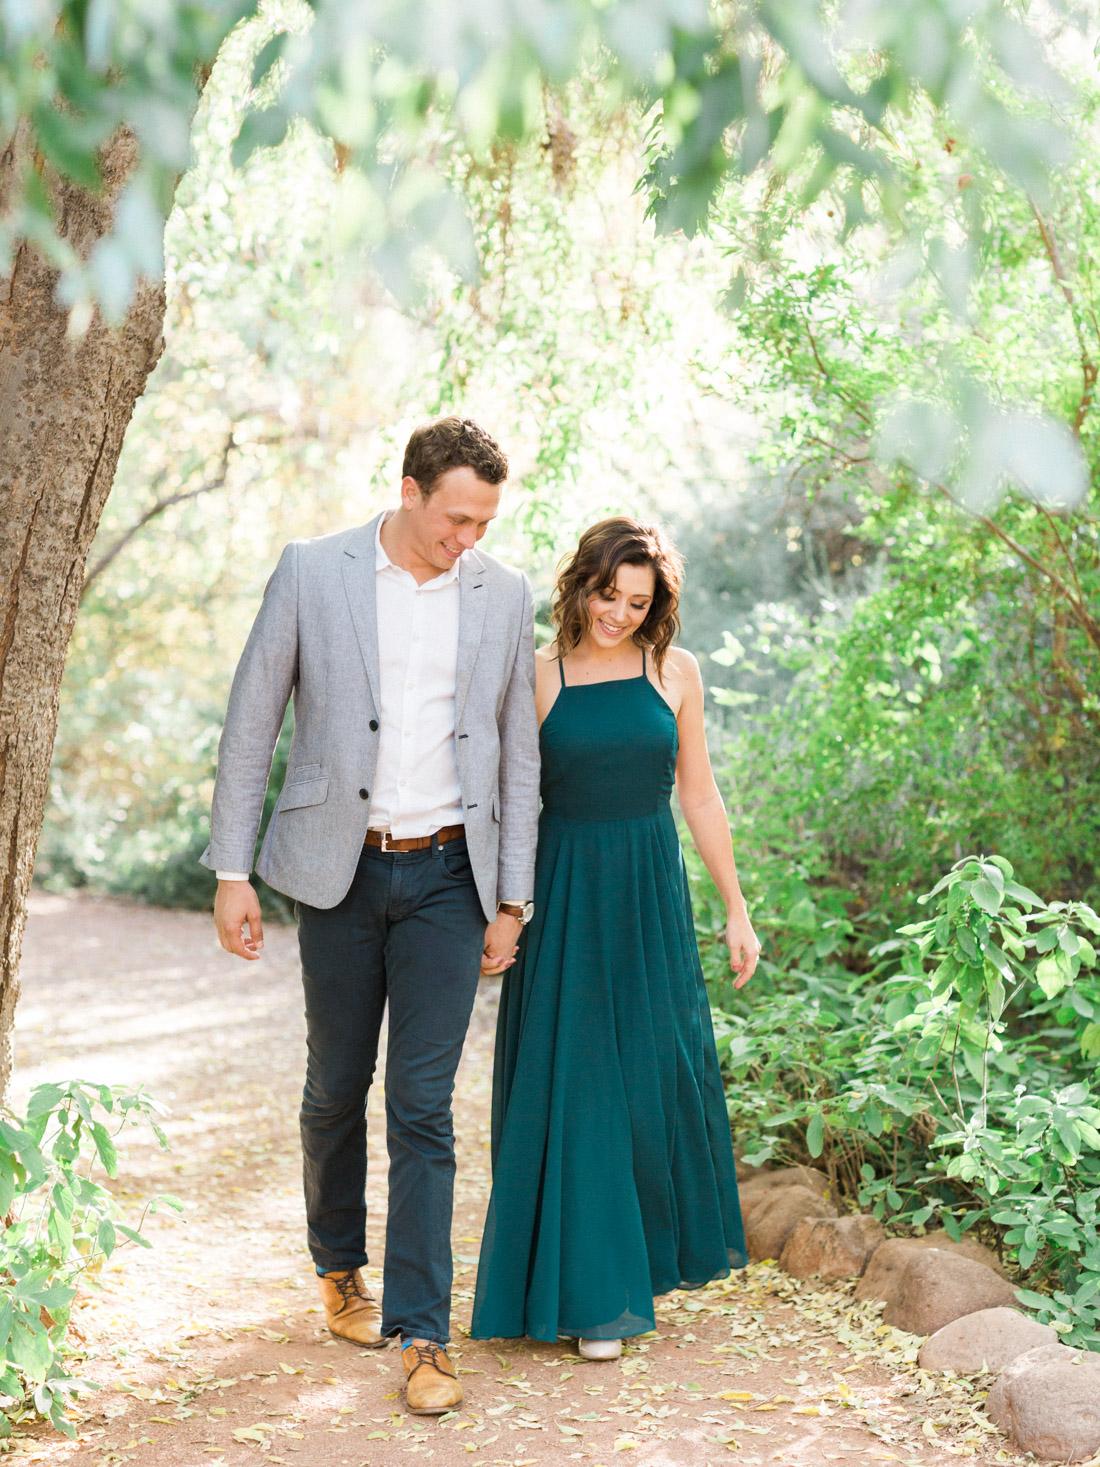 couple-walking.jpg